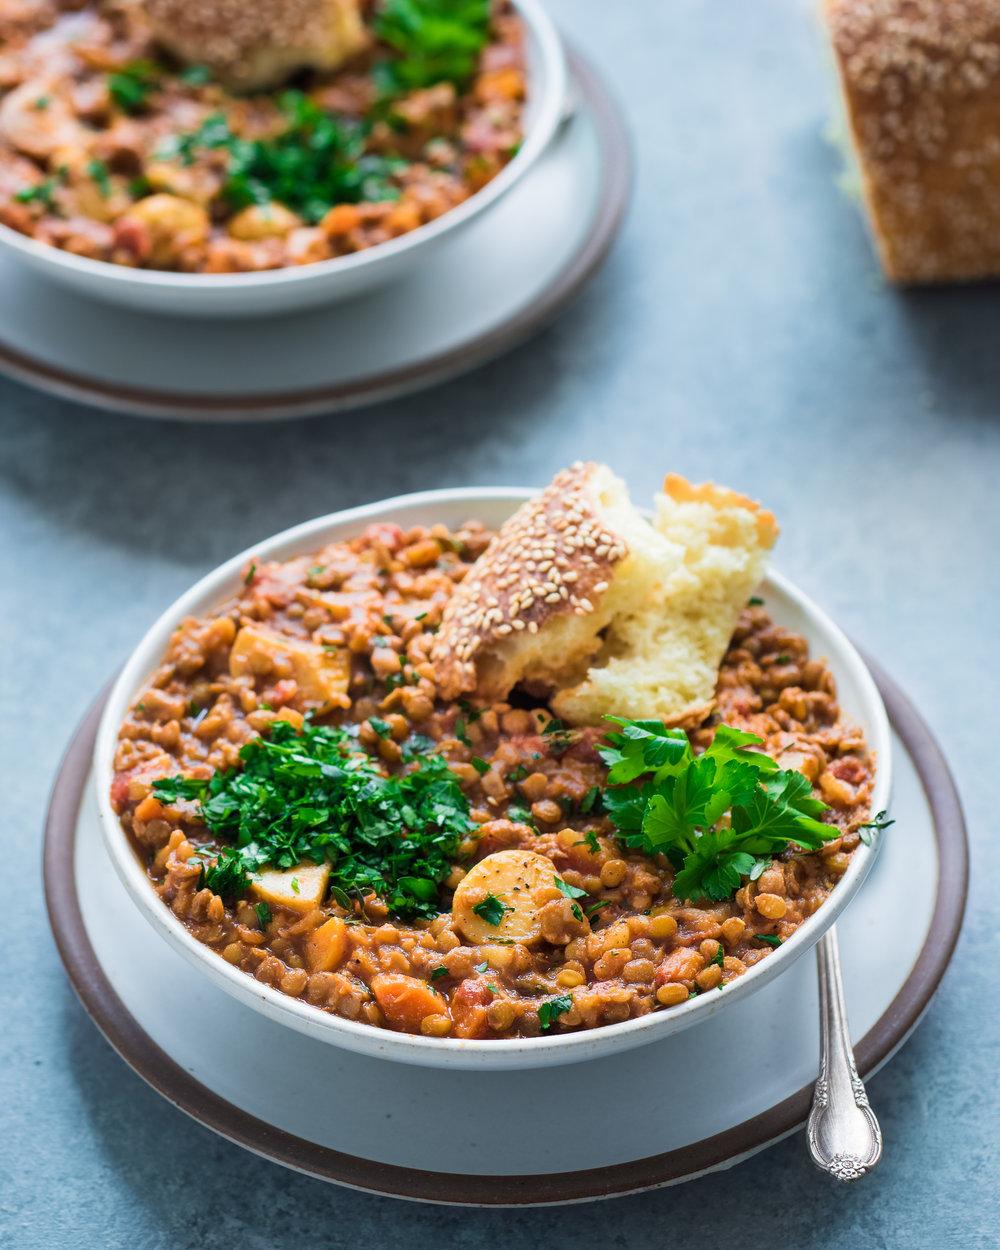 Instant Pot Lentil and Potato Stew - V, GF